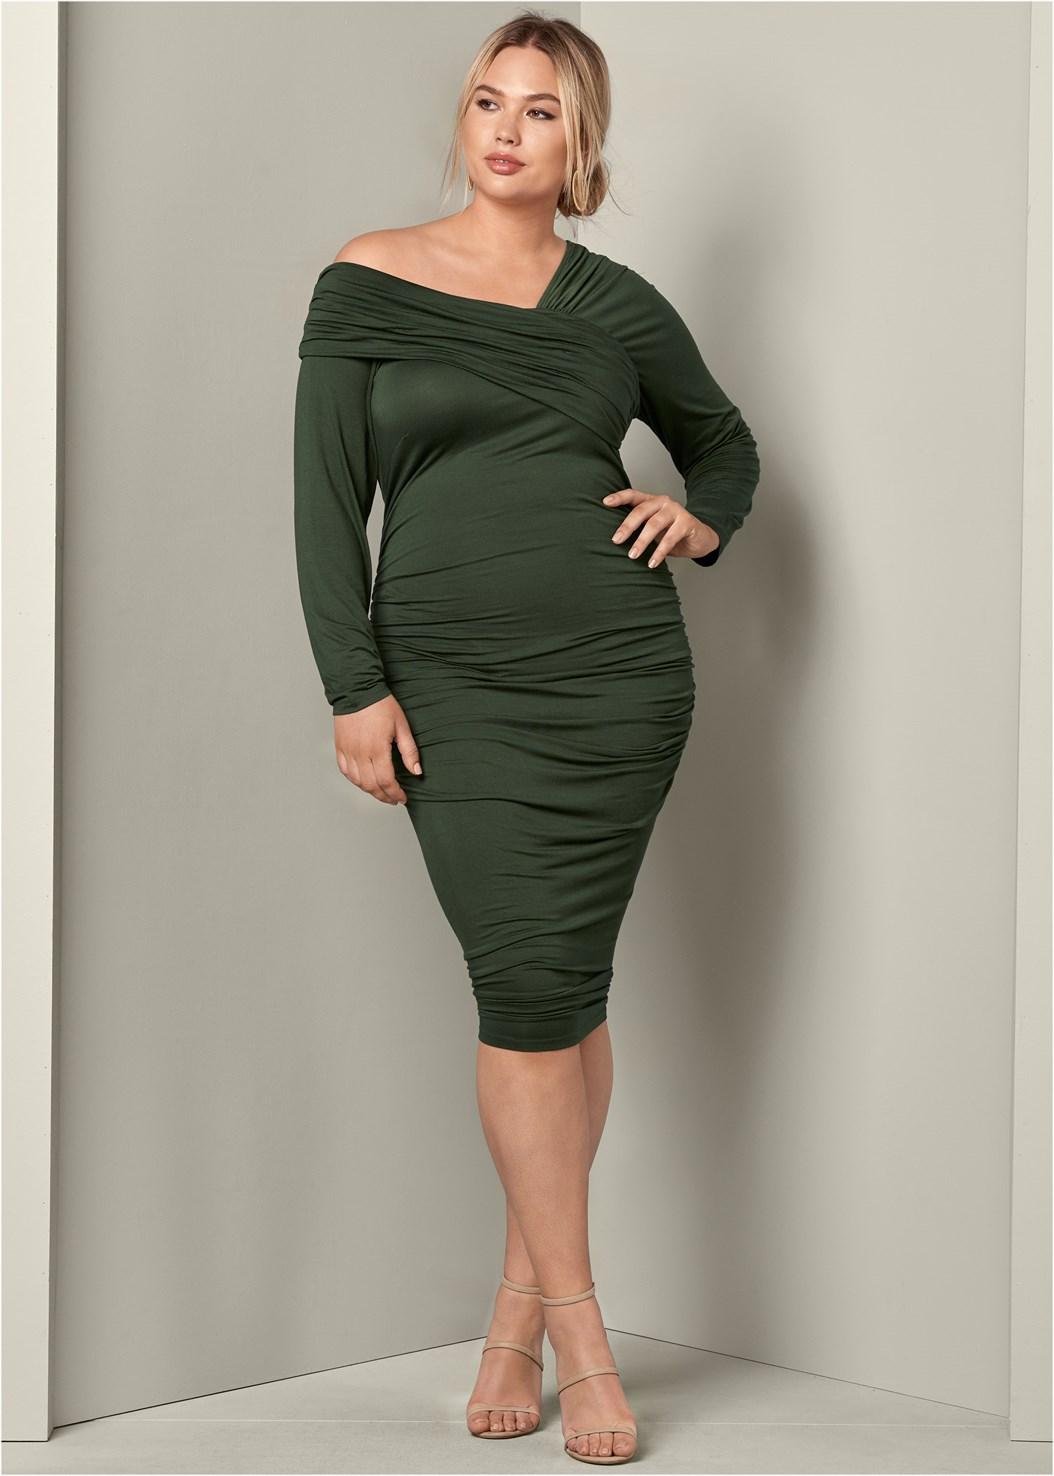 Venus ruched dress